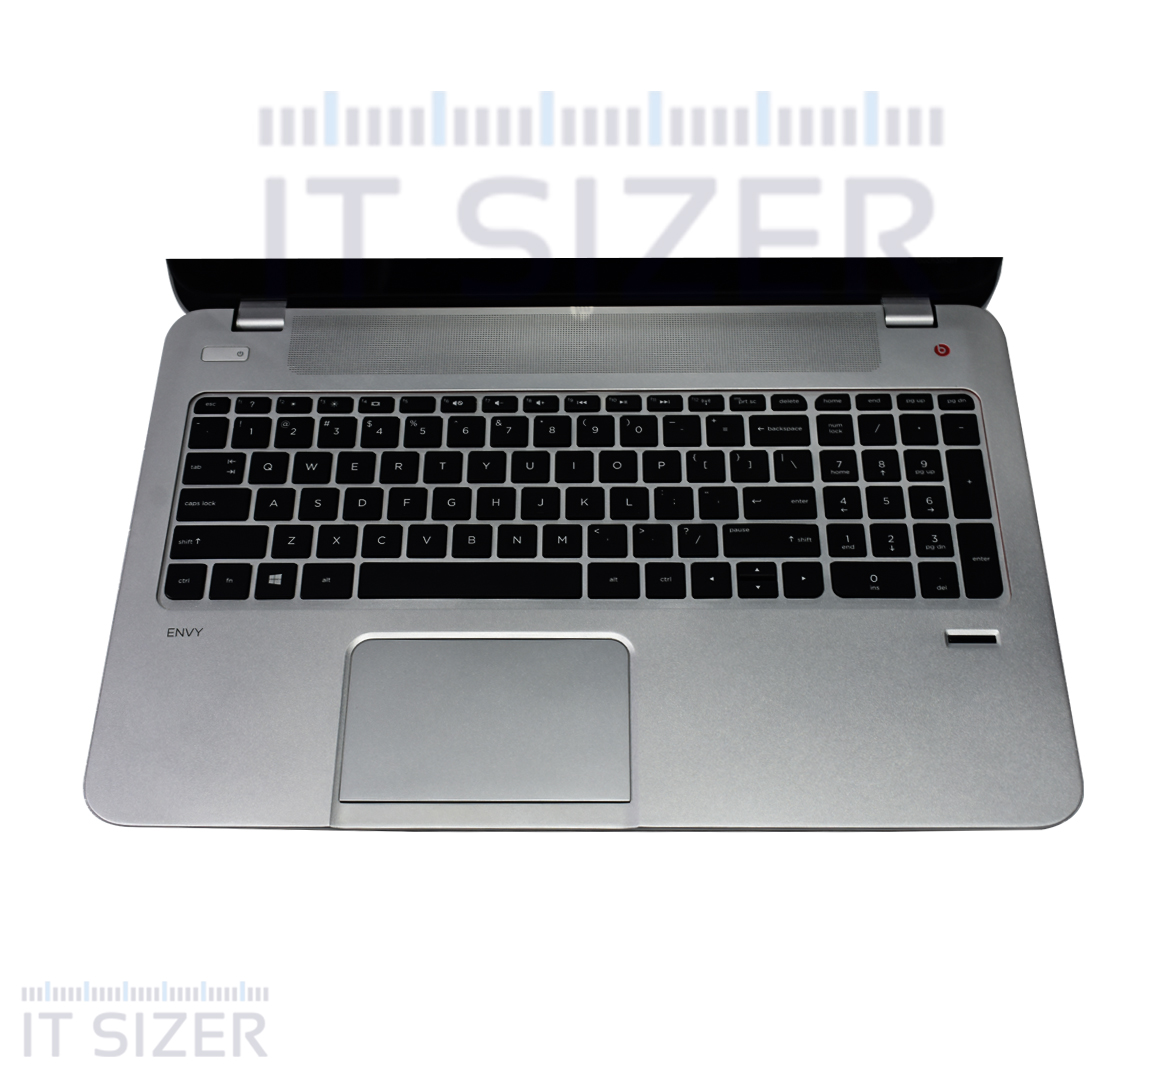 HP Envy TouchSmart 15 Business Laptop, AMD A8-5550M APU, 8GB DDR3L SODIMM RAM, 256GB SSD 2.5, 15 inch Touch Display, Windows 10 Pro (Renewed)